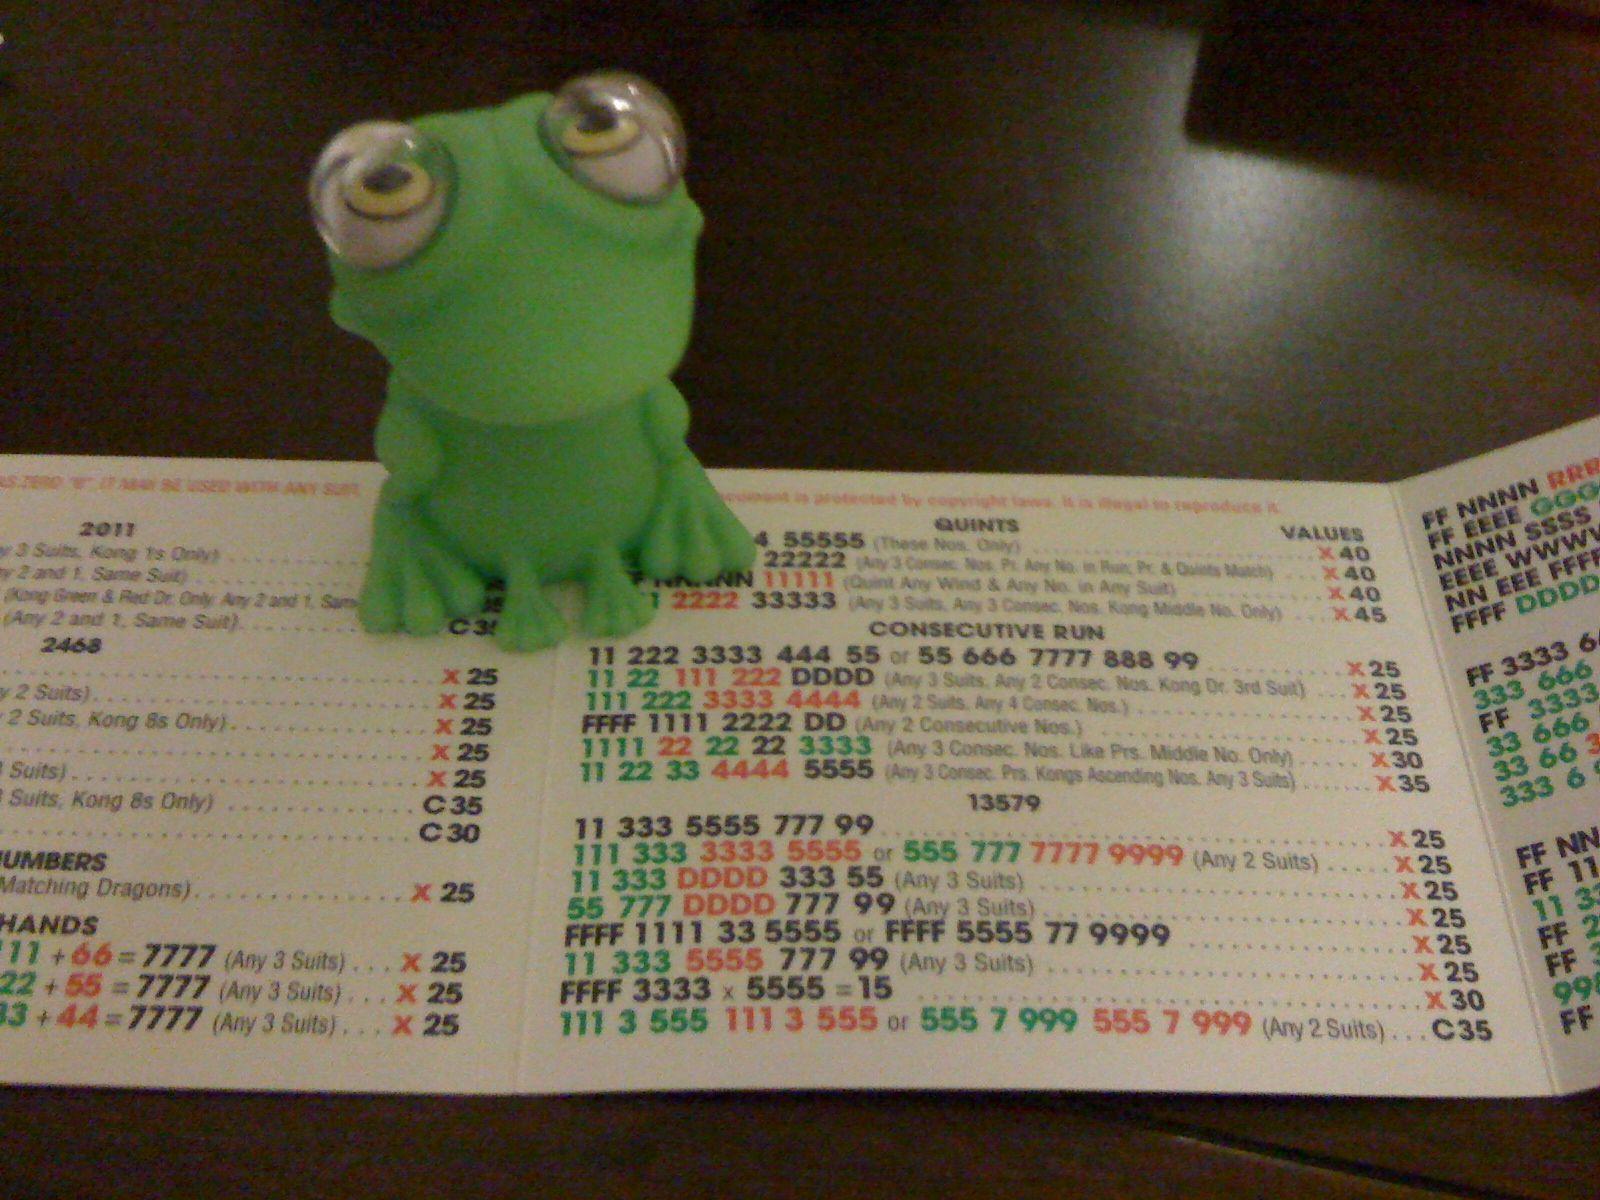 Lucky mah jongg frog Rummy, Mah, Gin rummy